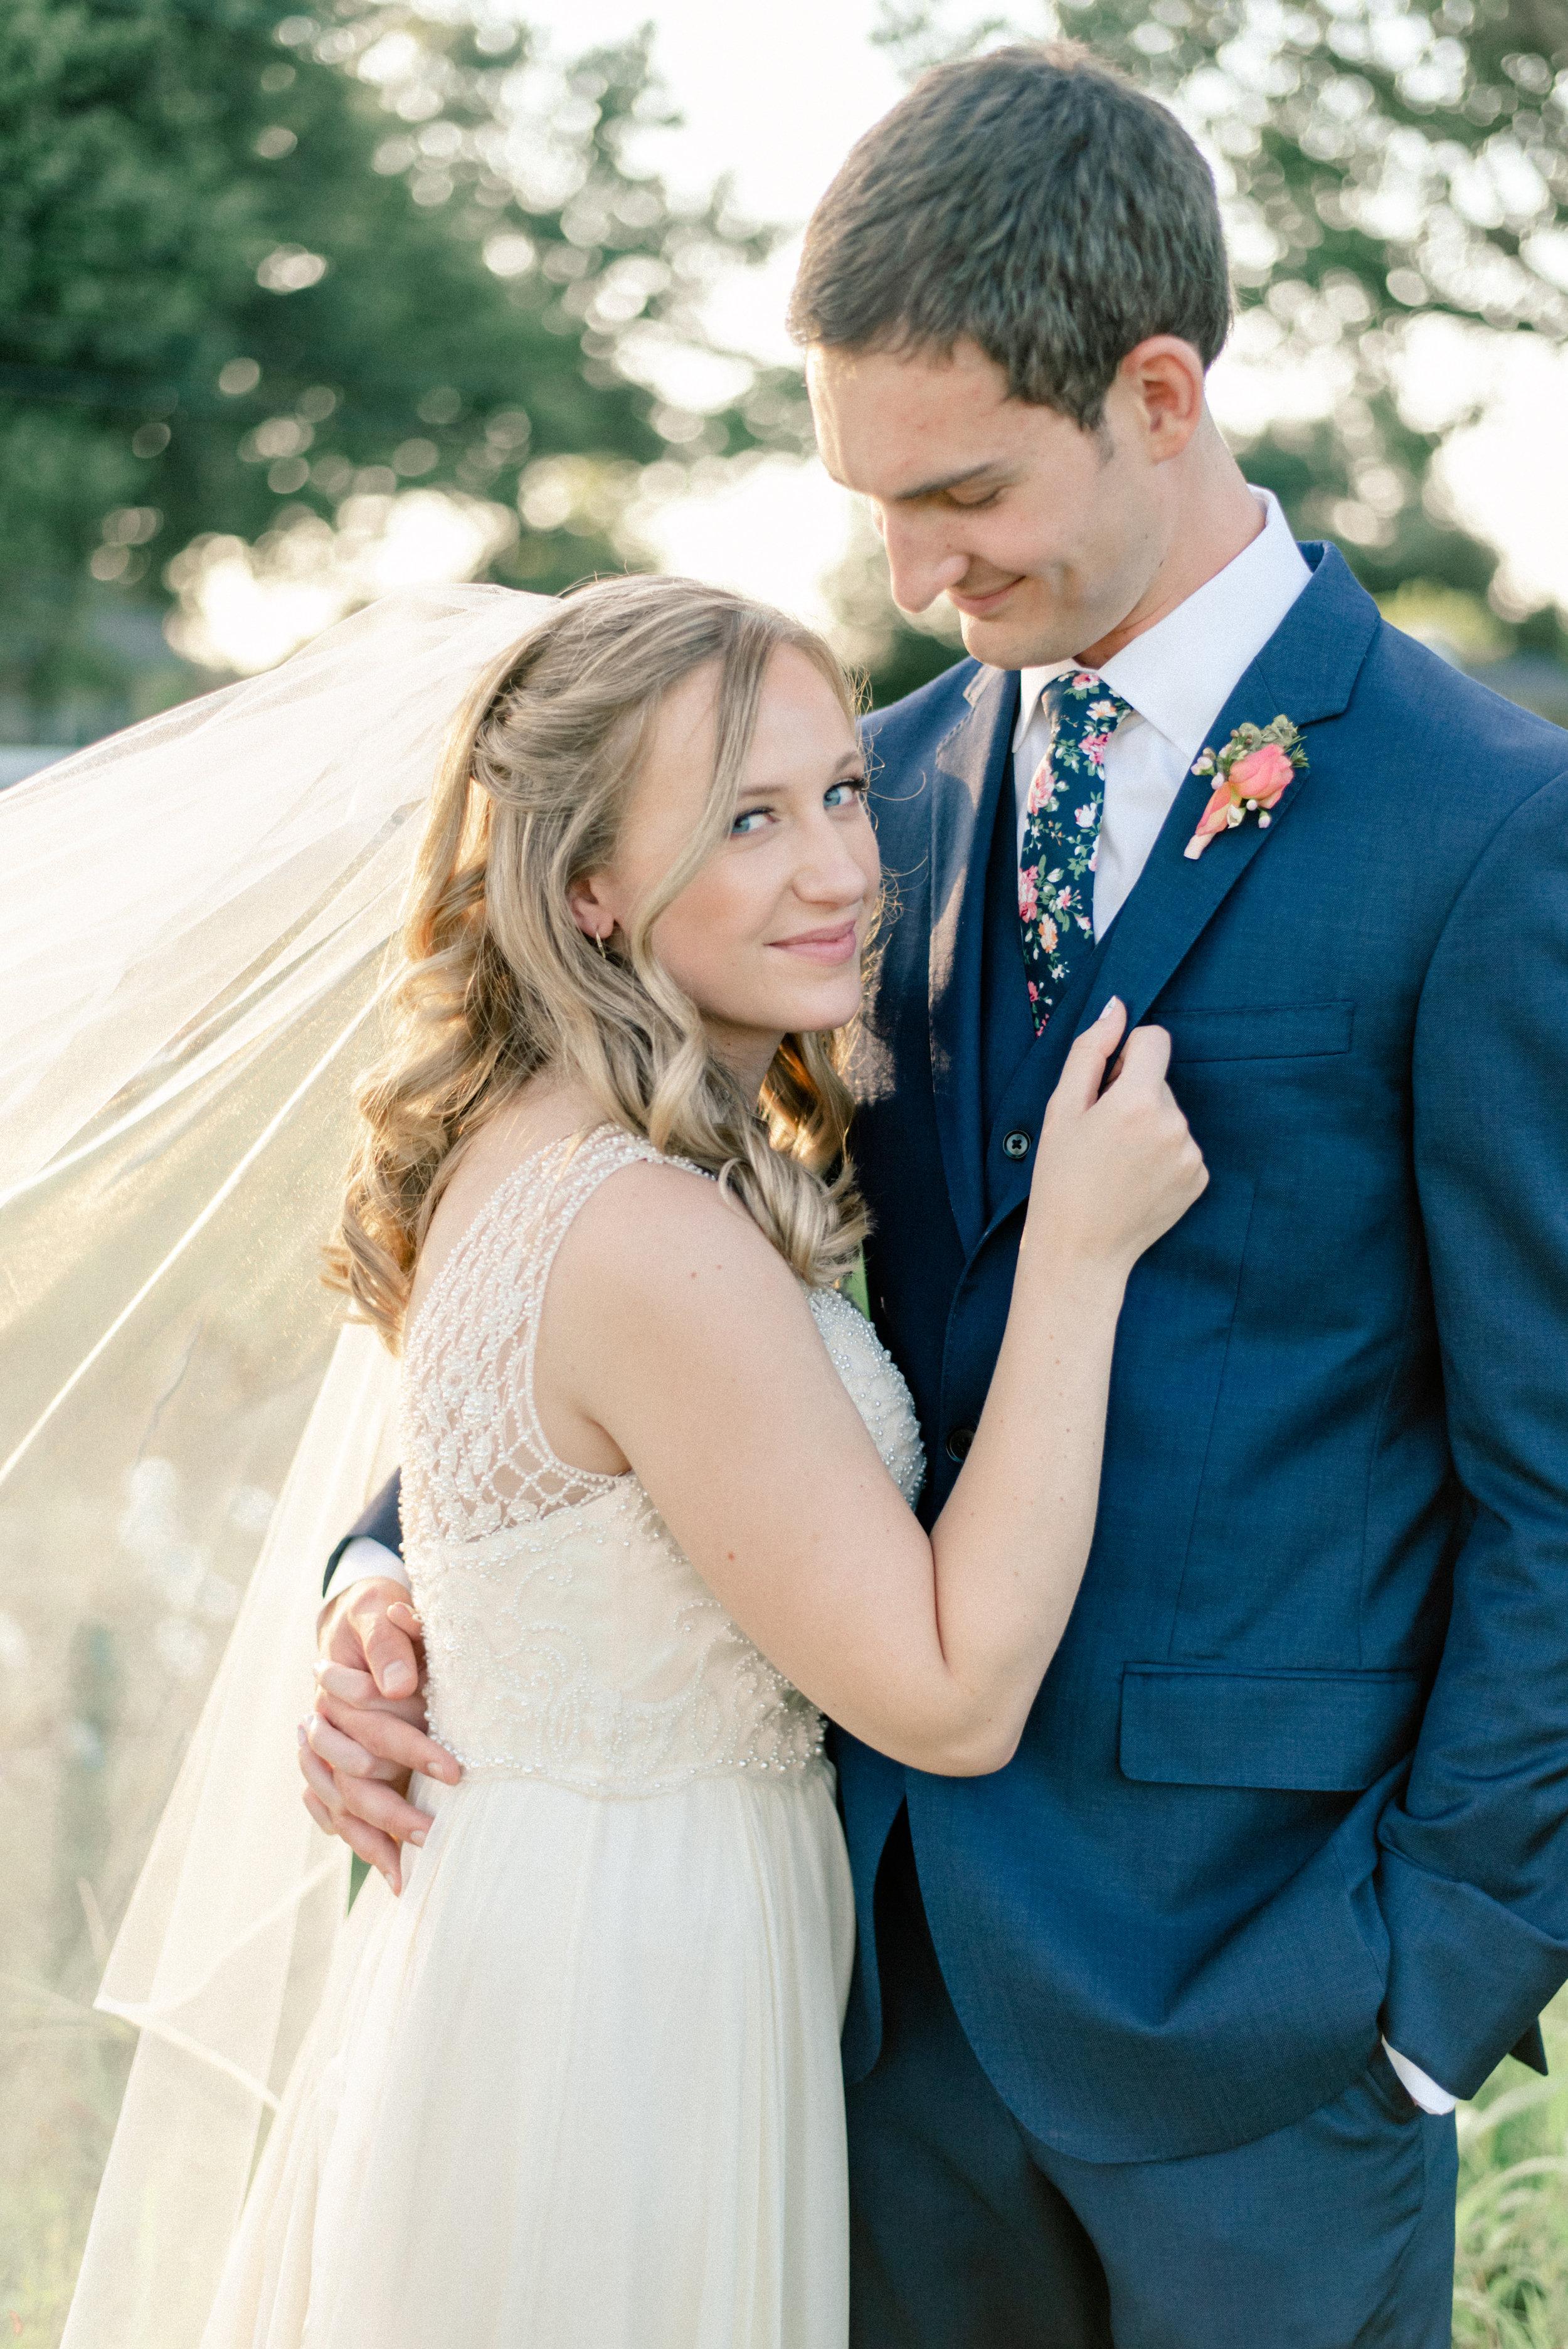 Brideandgroom-Anna+Dan_(18_of_50).jpg